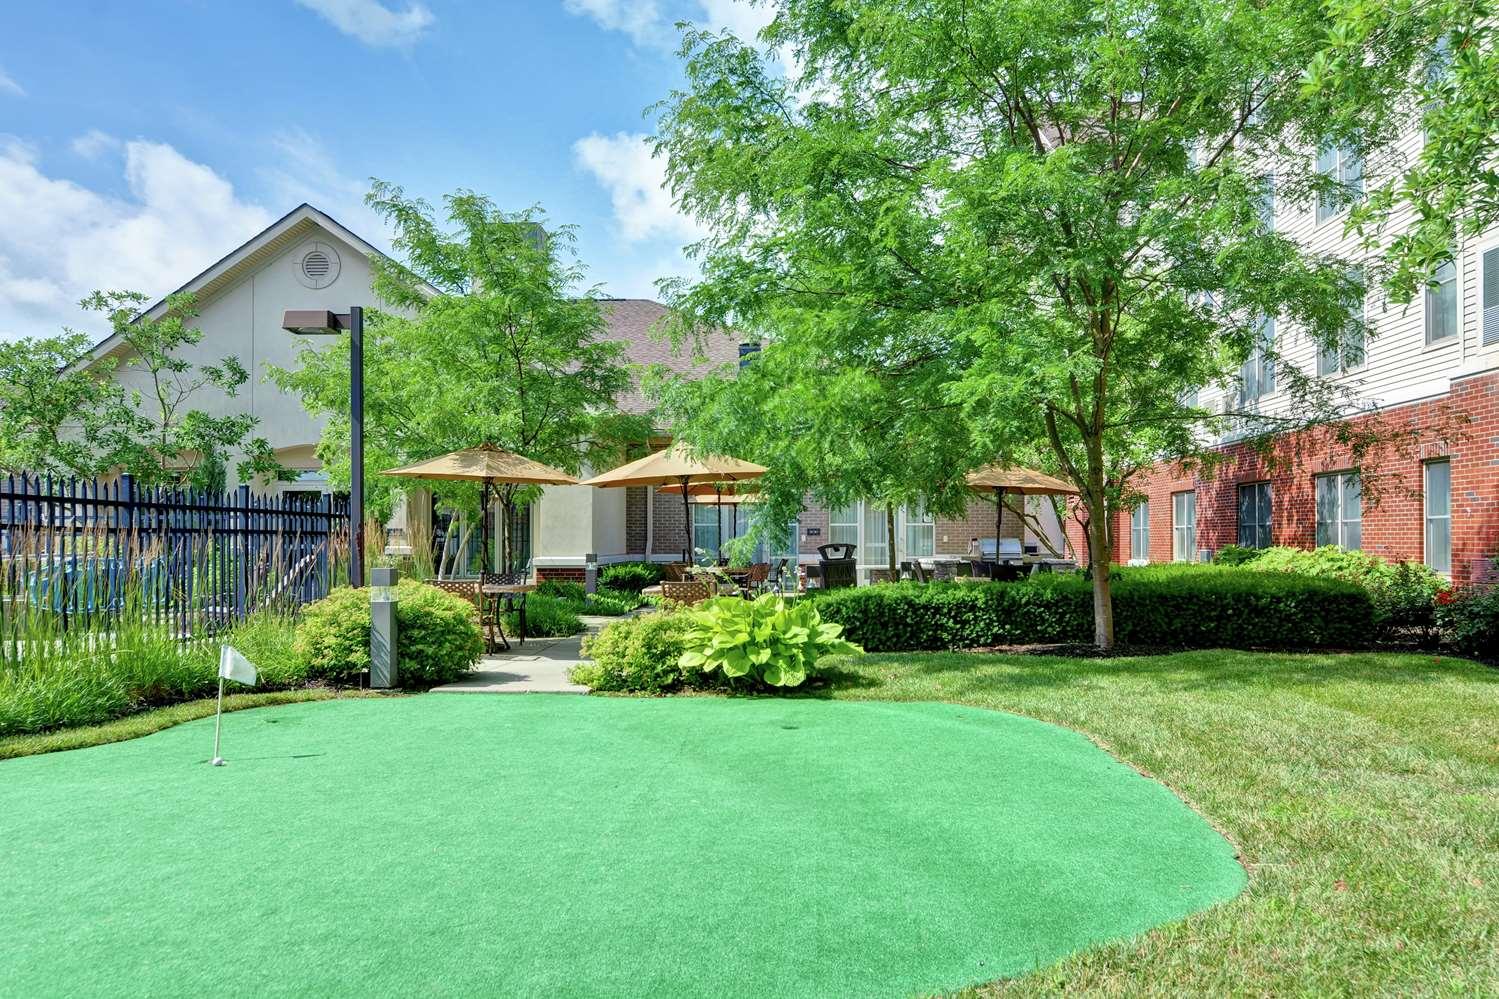 Recreation - Homewood Suites by Hilton Fayette Mall Lexington